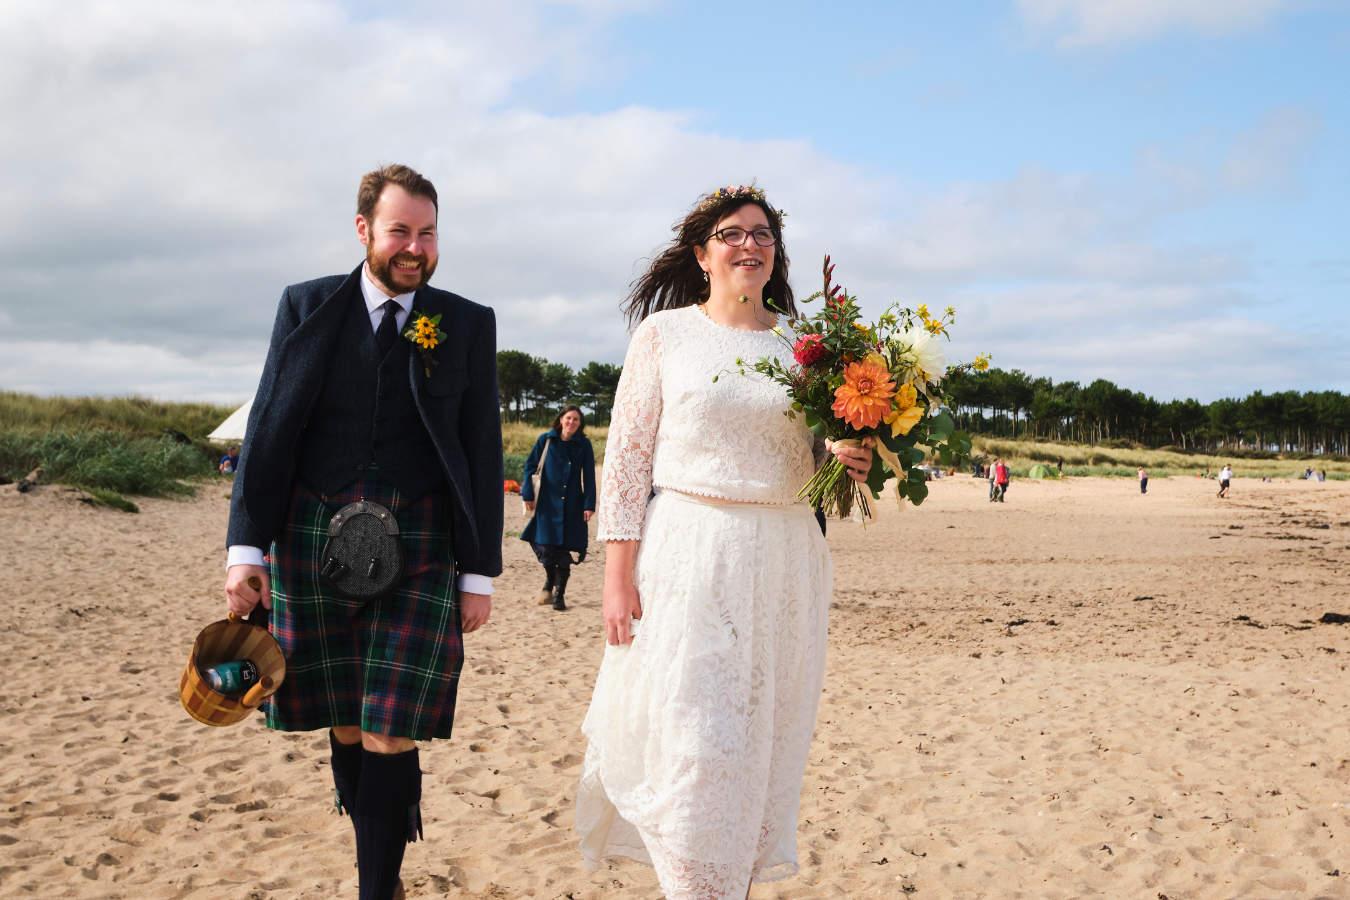 Image showing micro-wedding taking place at Yellowcraig Beach